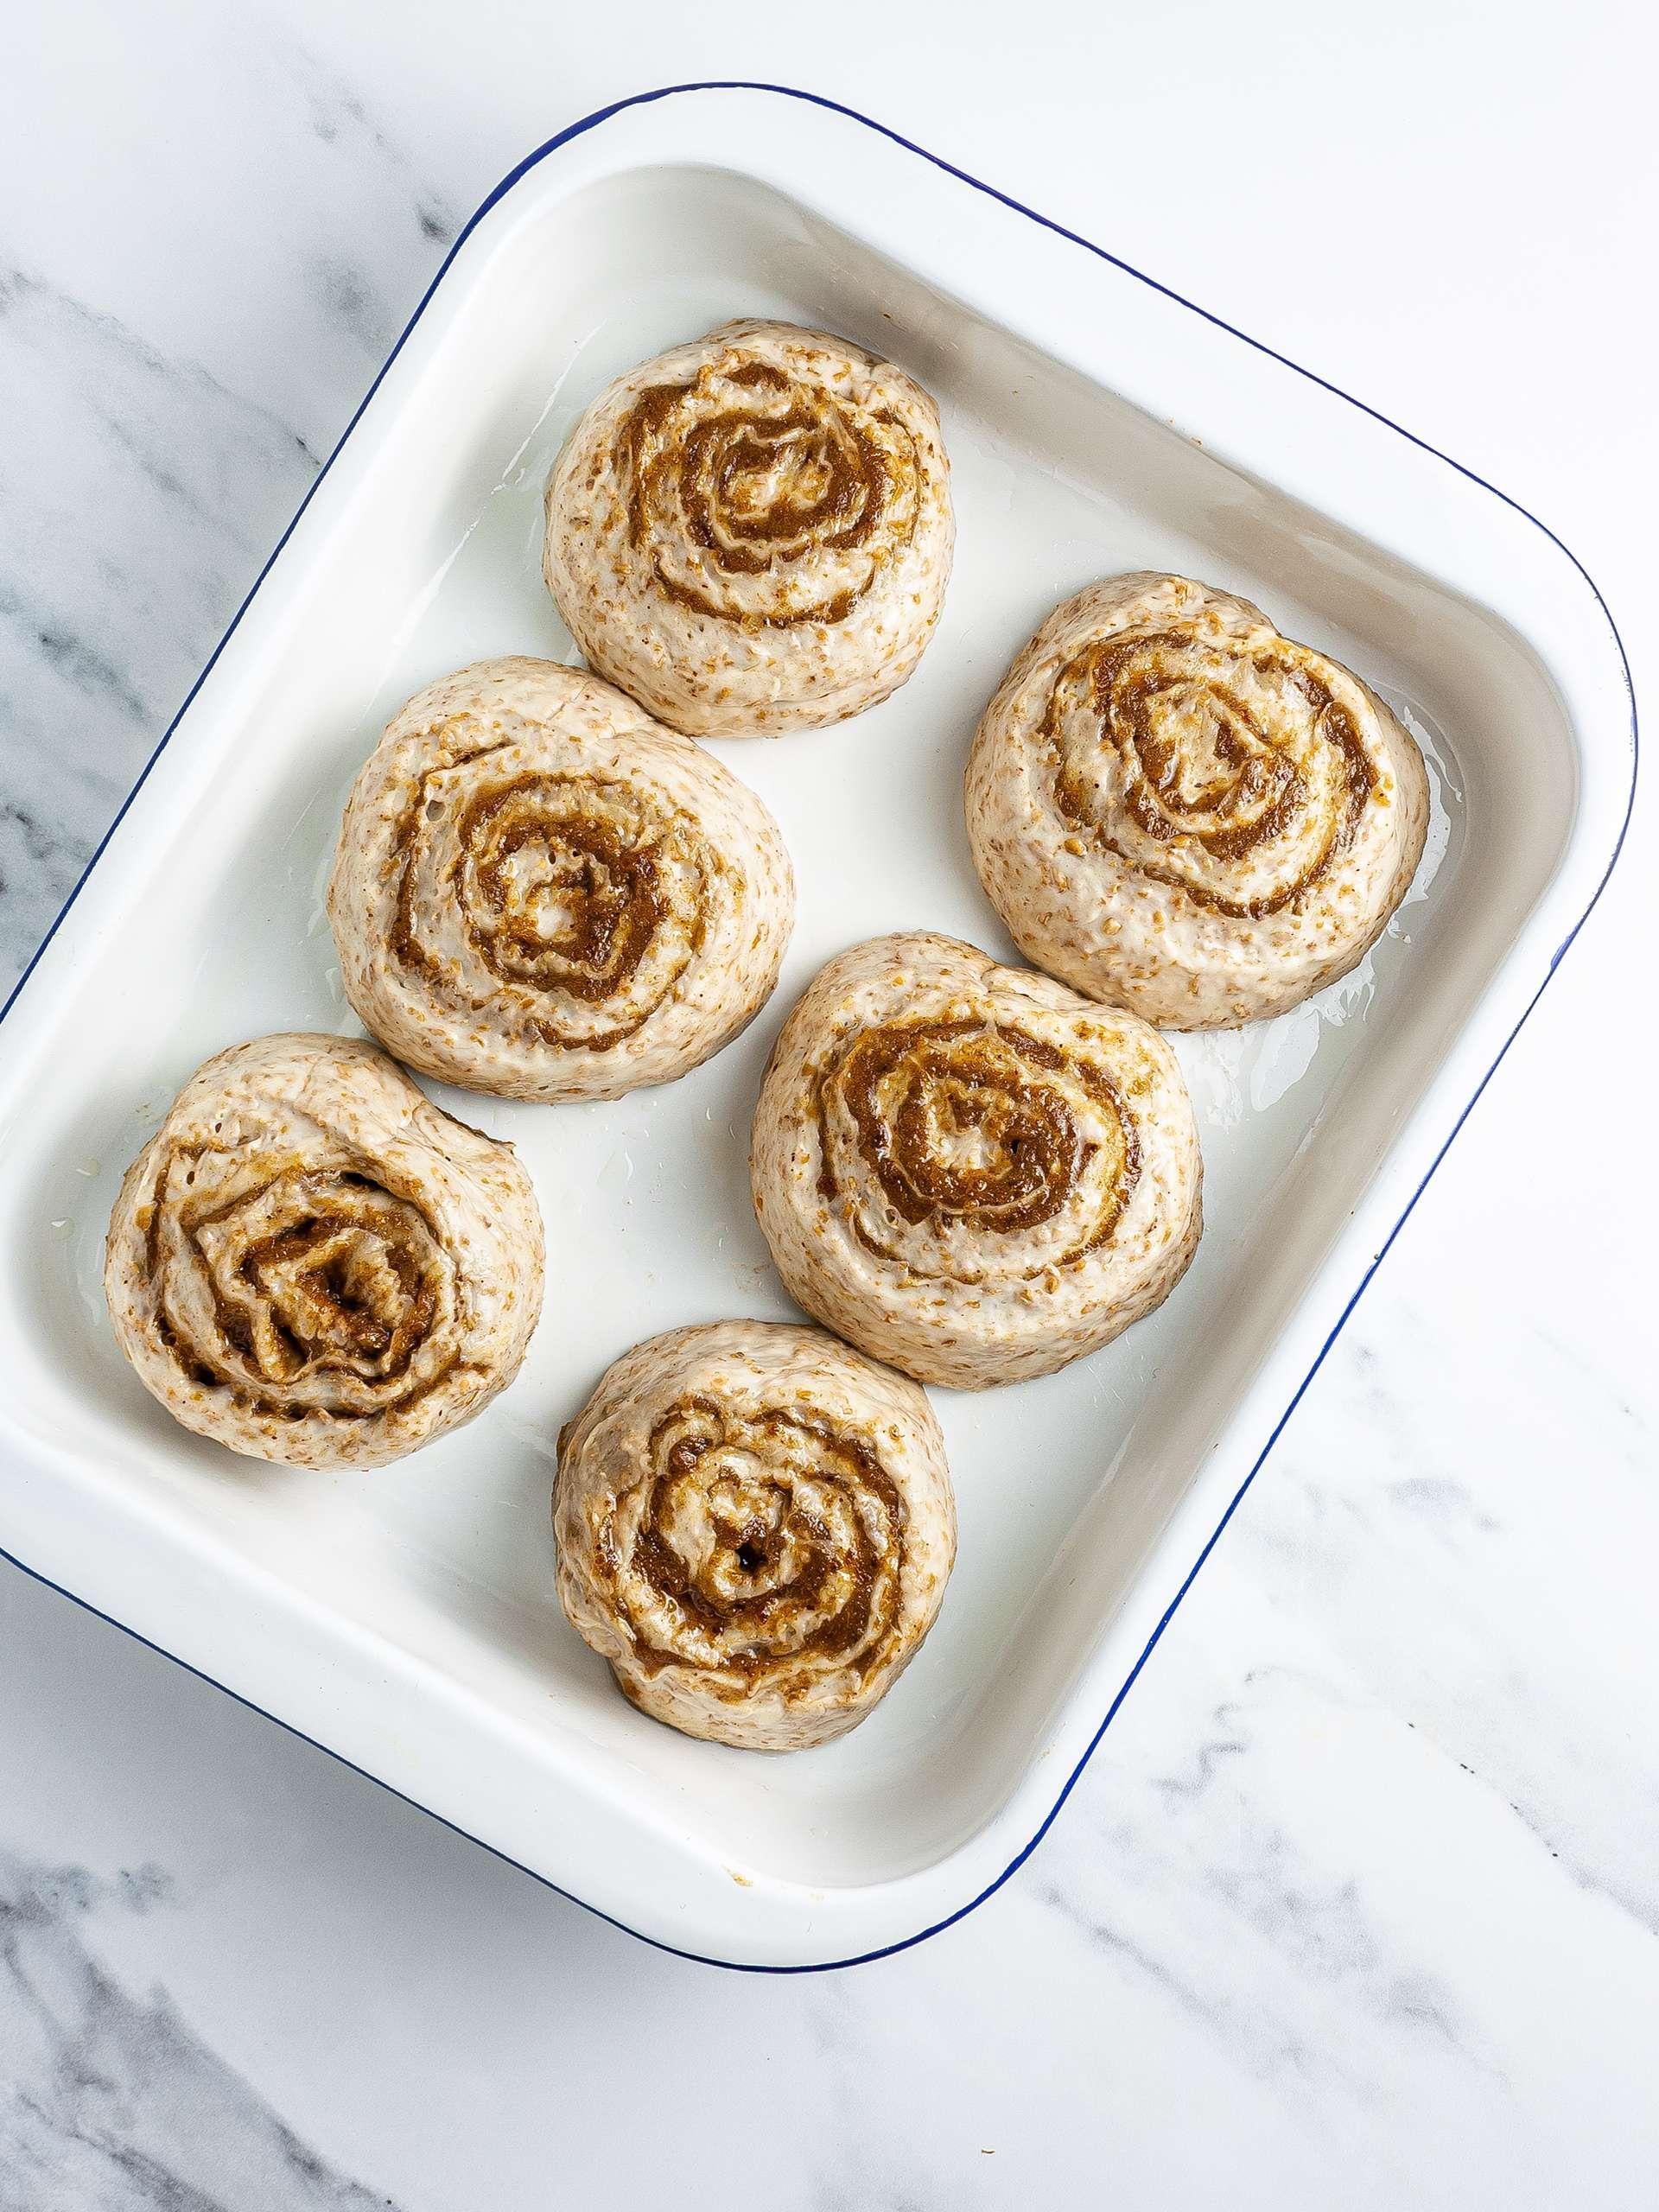 Proved rolls